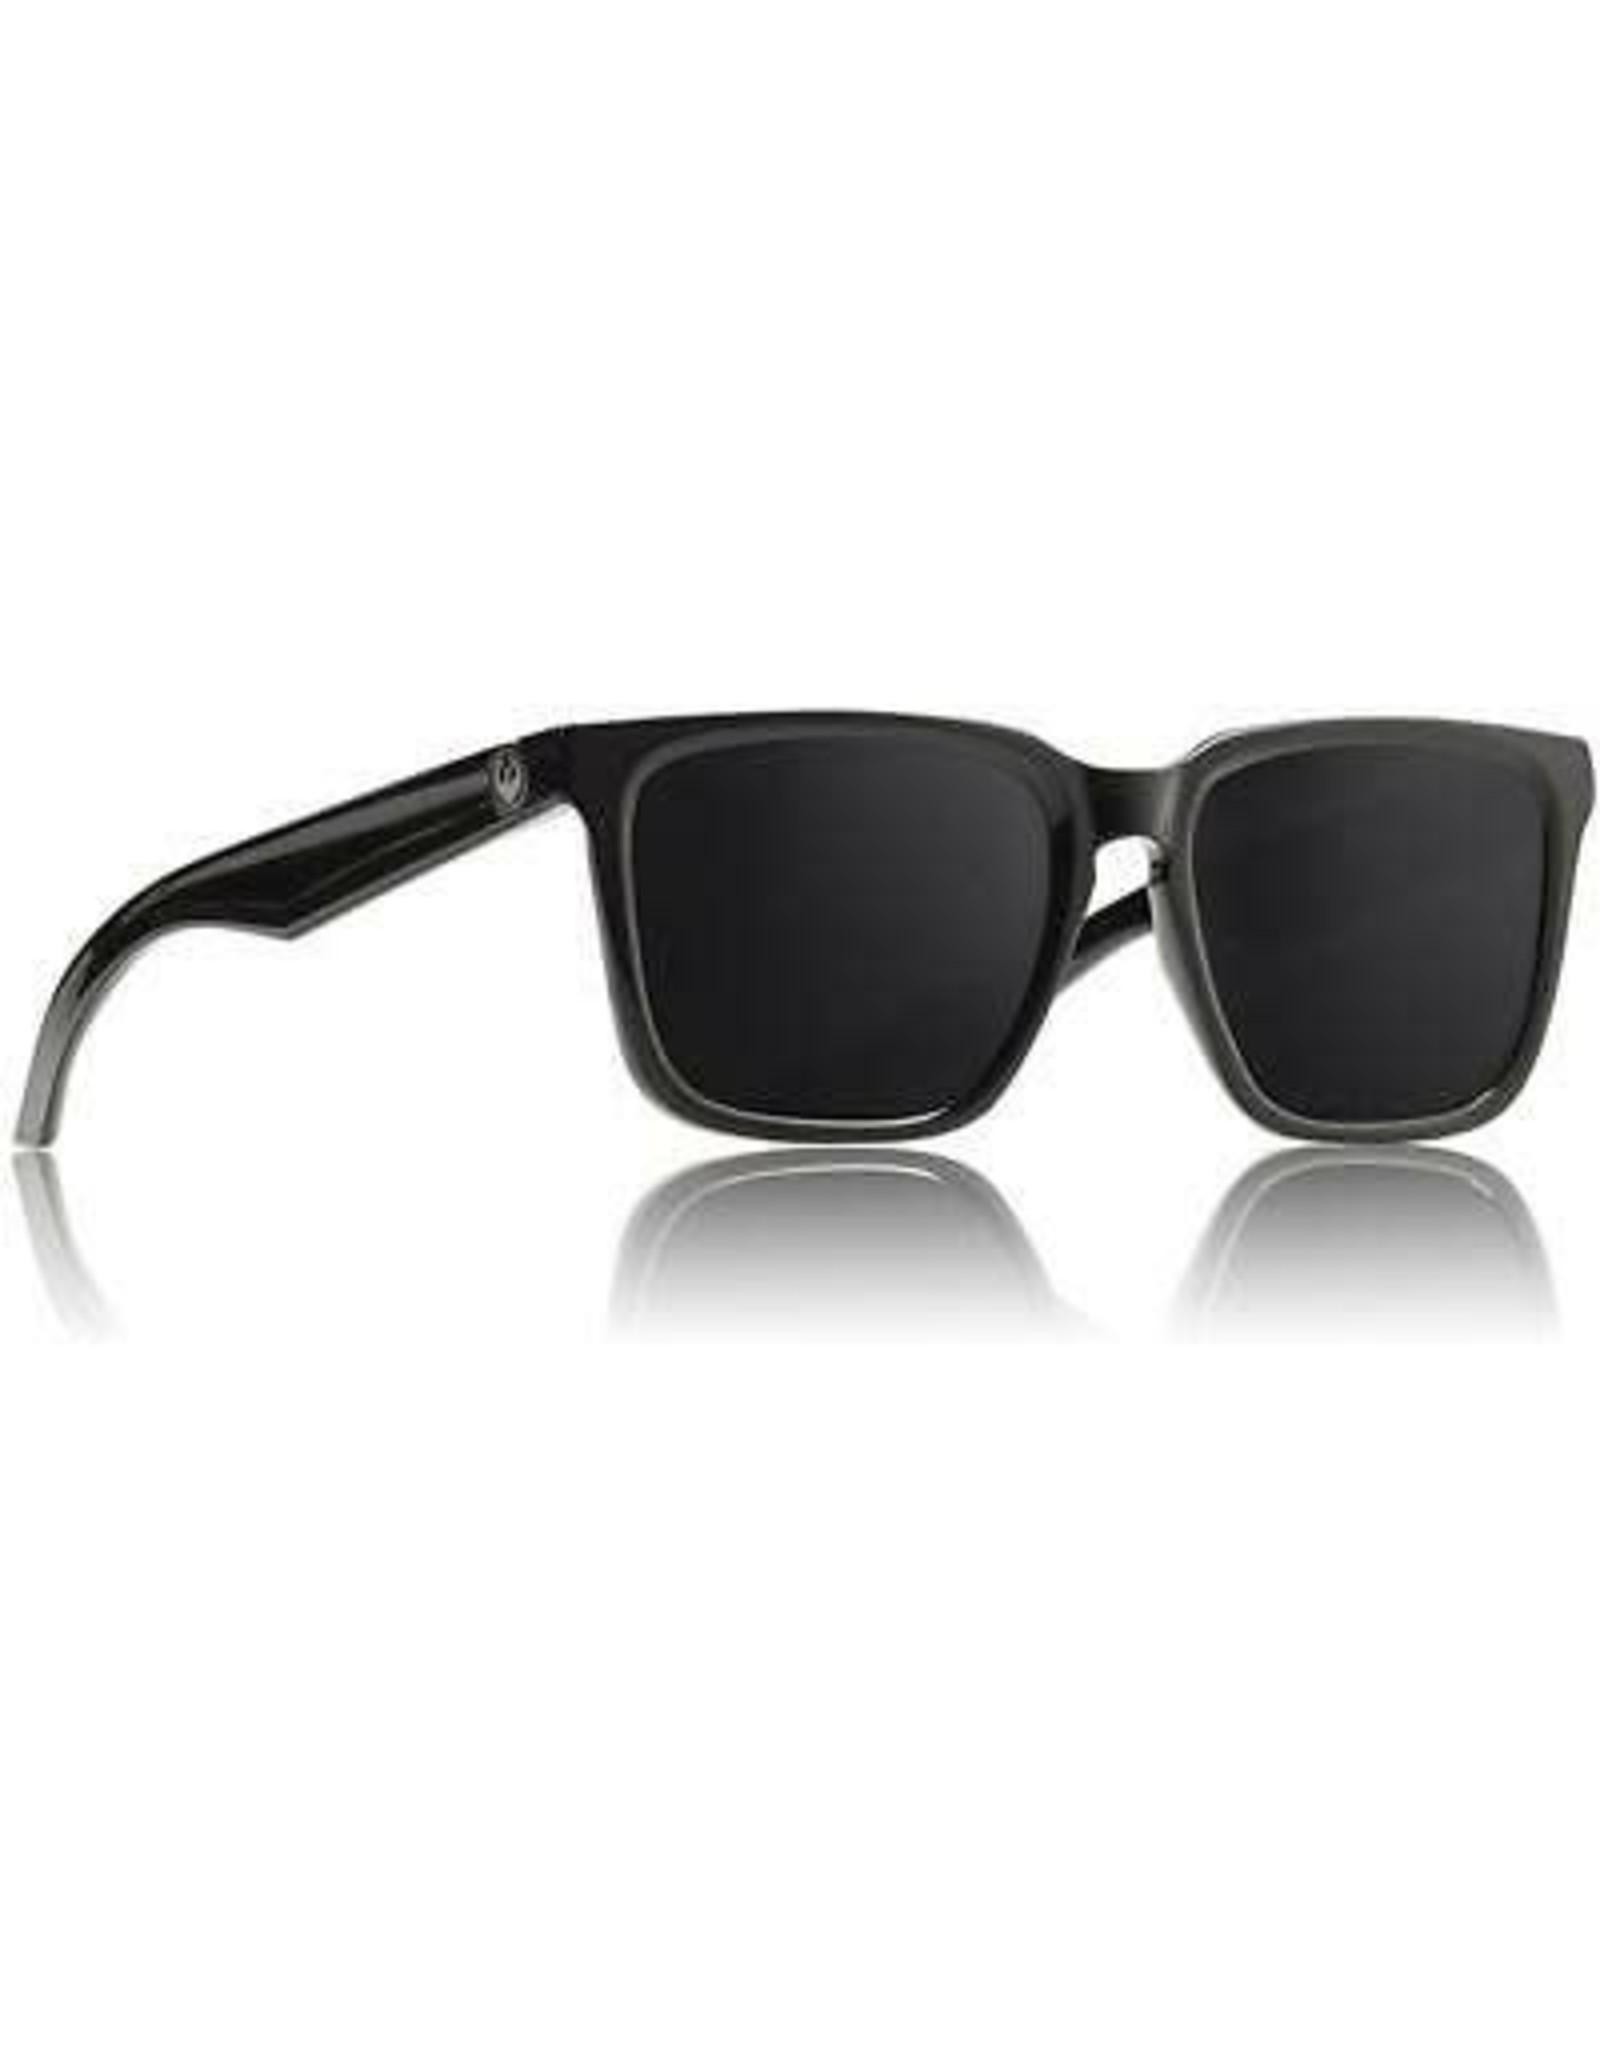 DRAGON Baile Shiny Jet Black/Grey Sunglasses